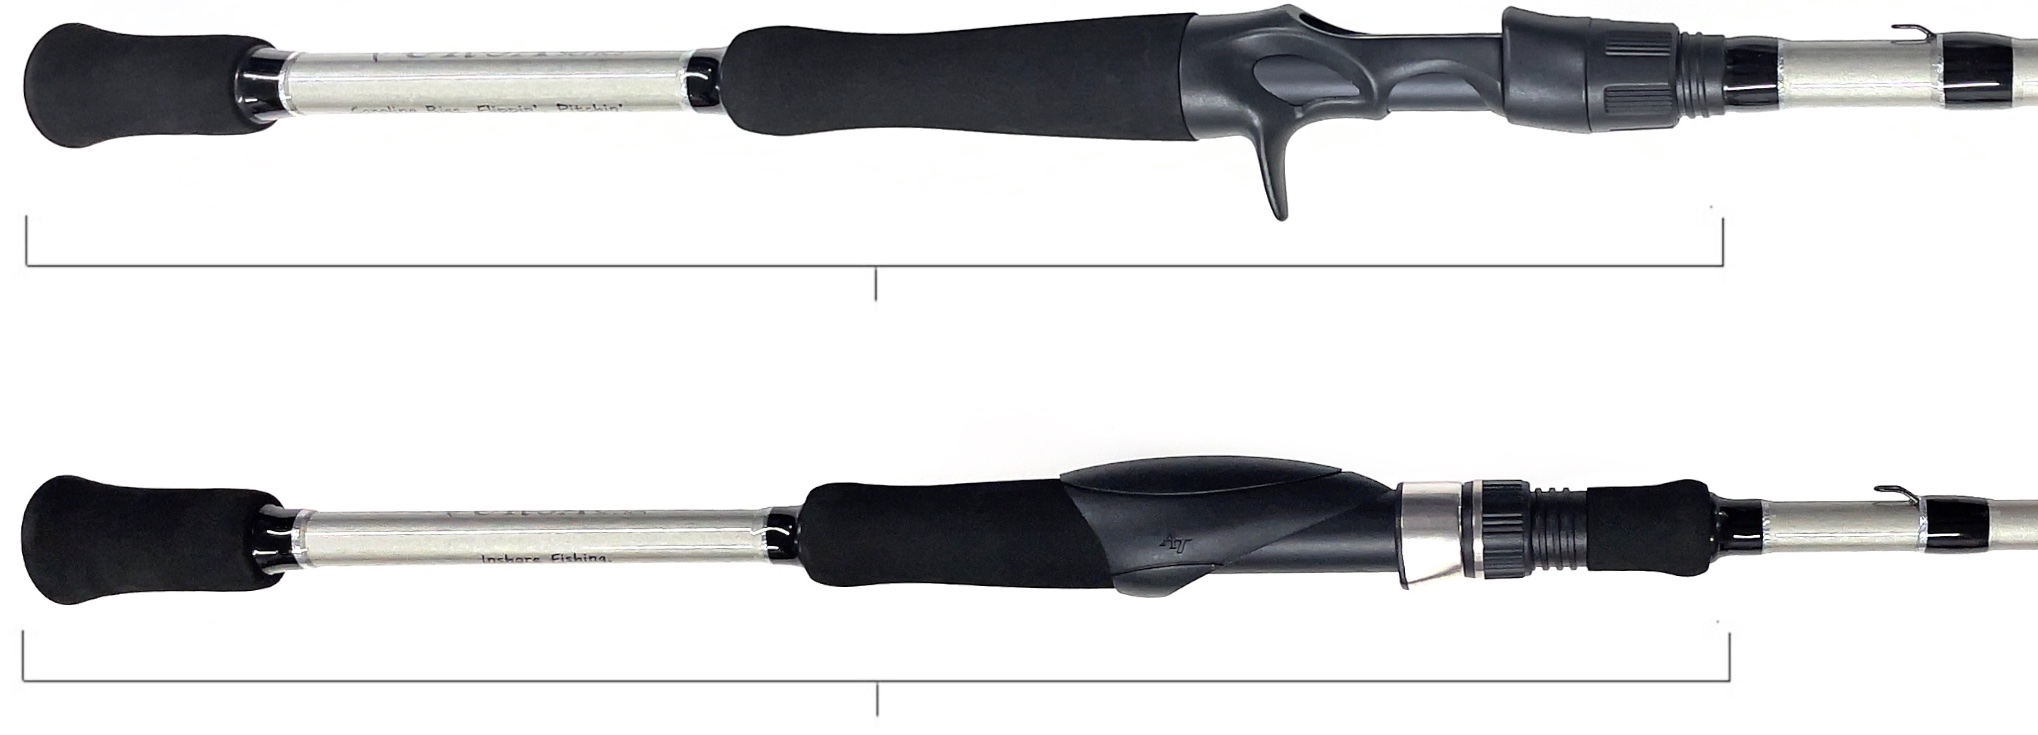 vursa-casting-spinning-handle.jpg